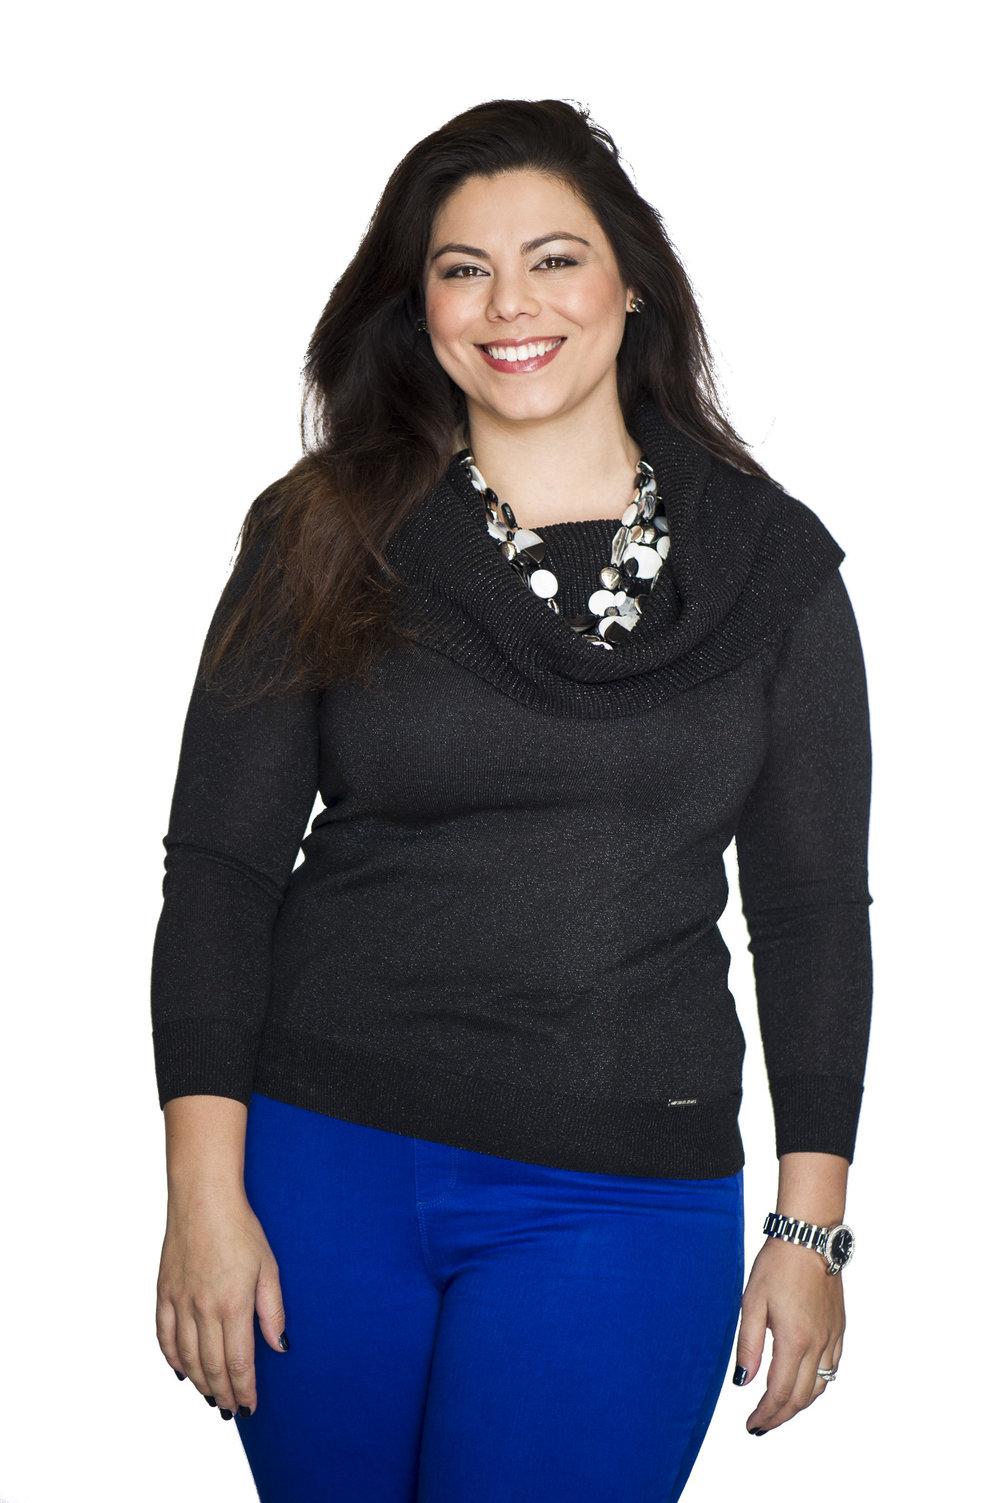 Kimberly Seeherman | Chief Creative Officer